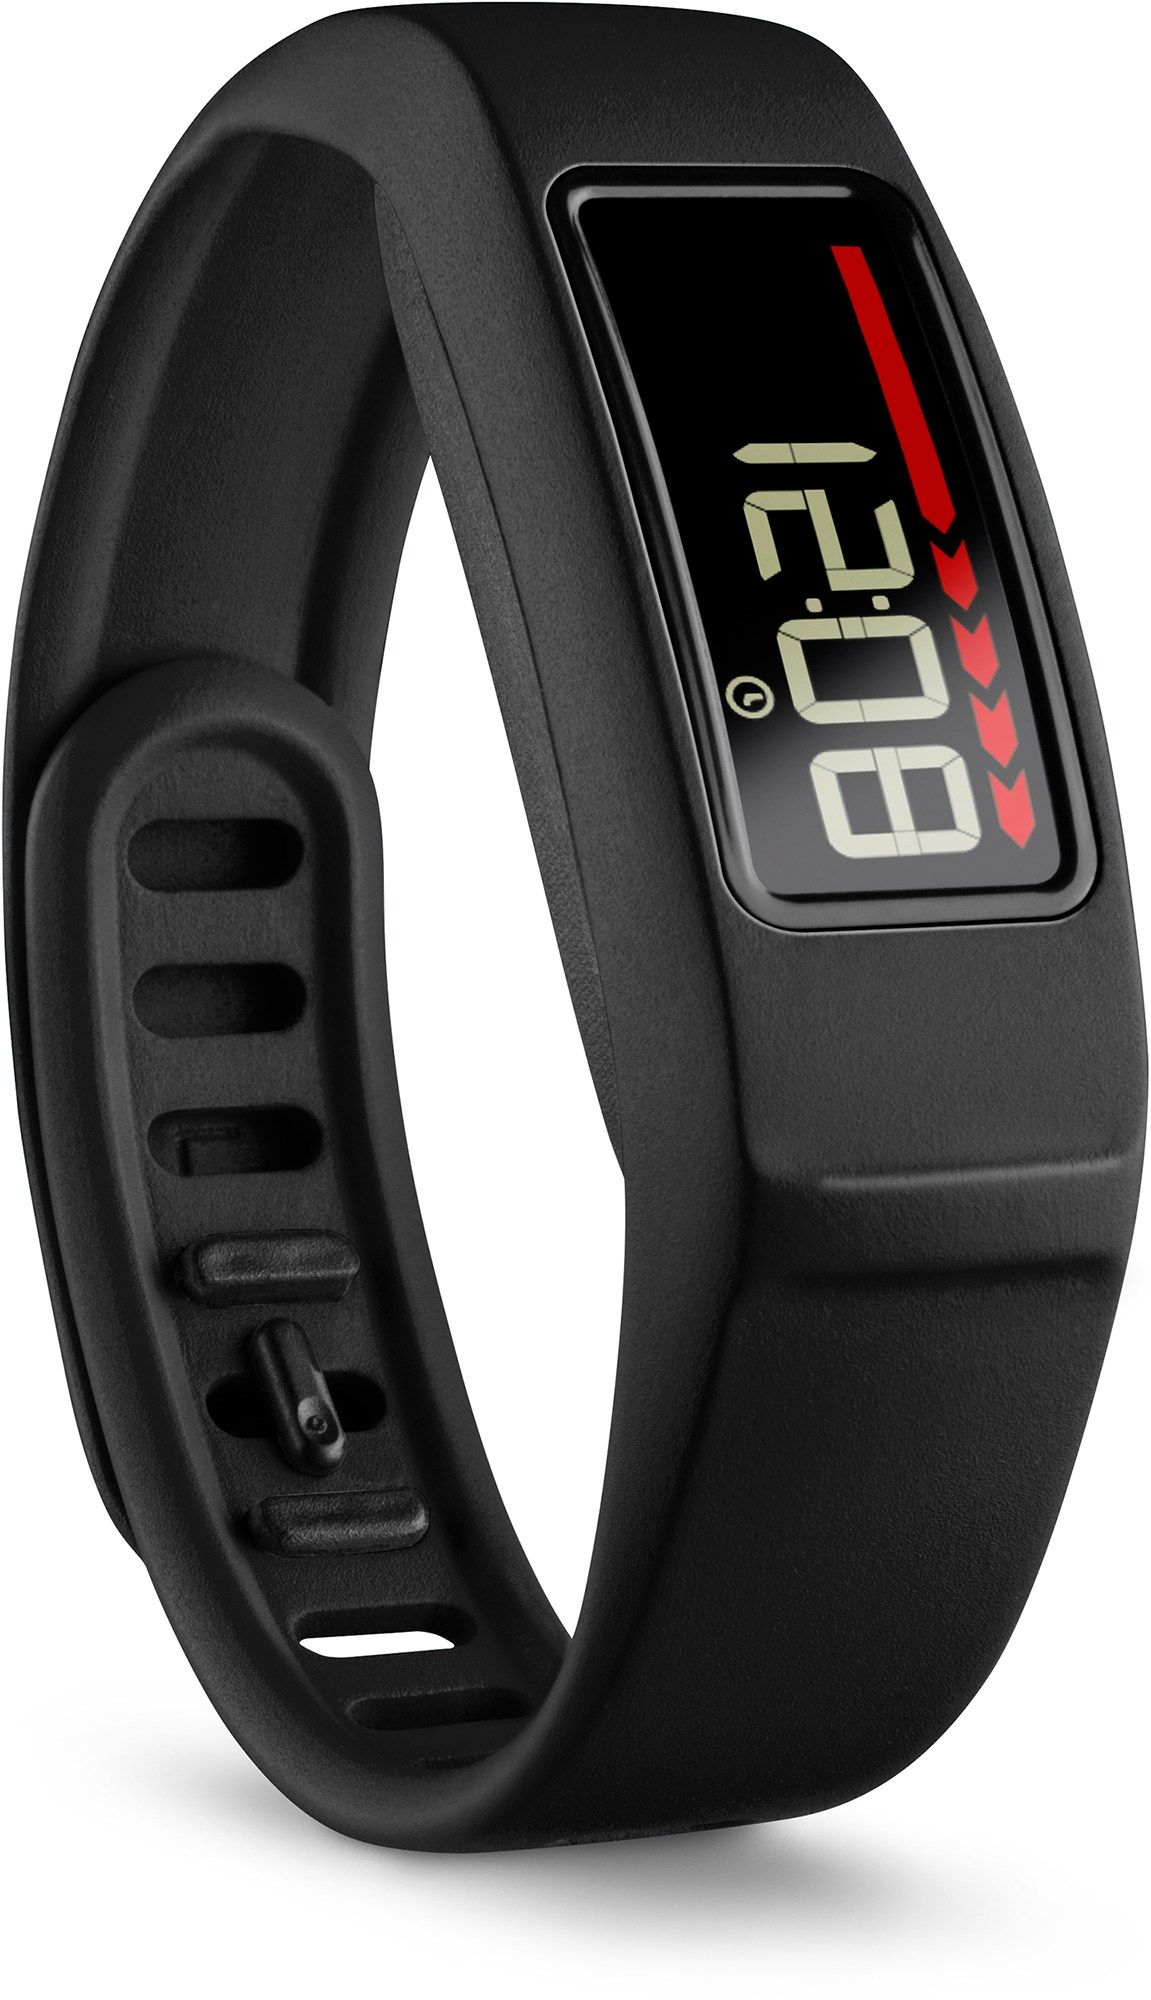 Garmin vivofit 2 Wireless Activity Tracker and Heart Rate